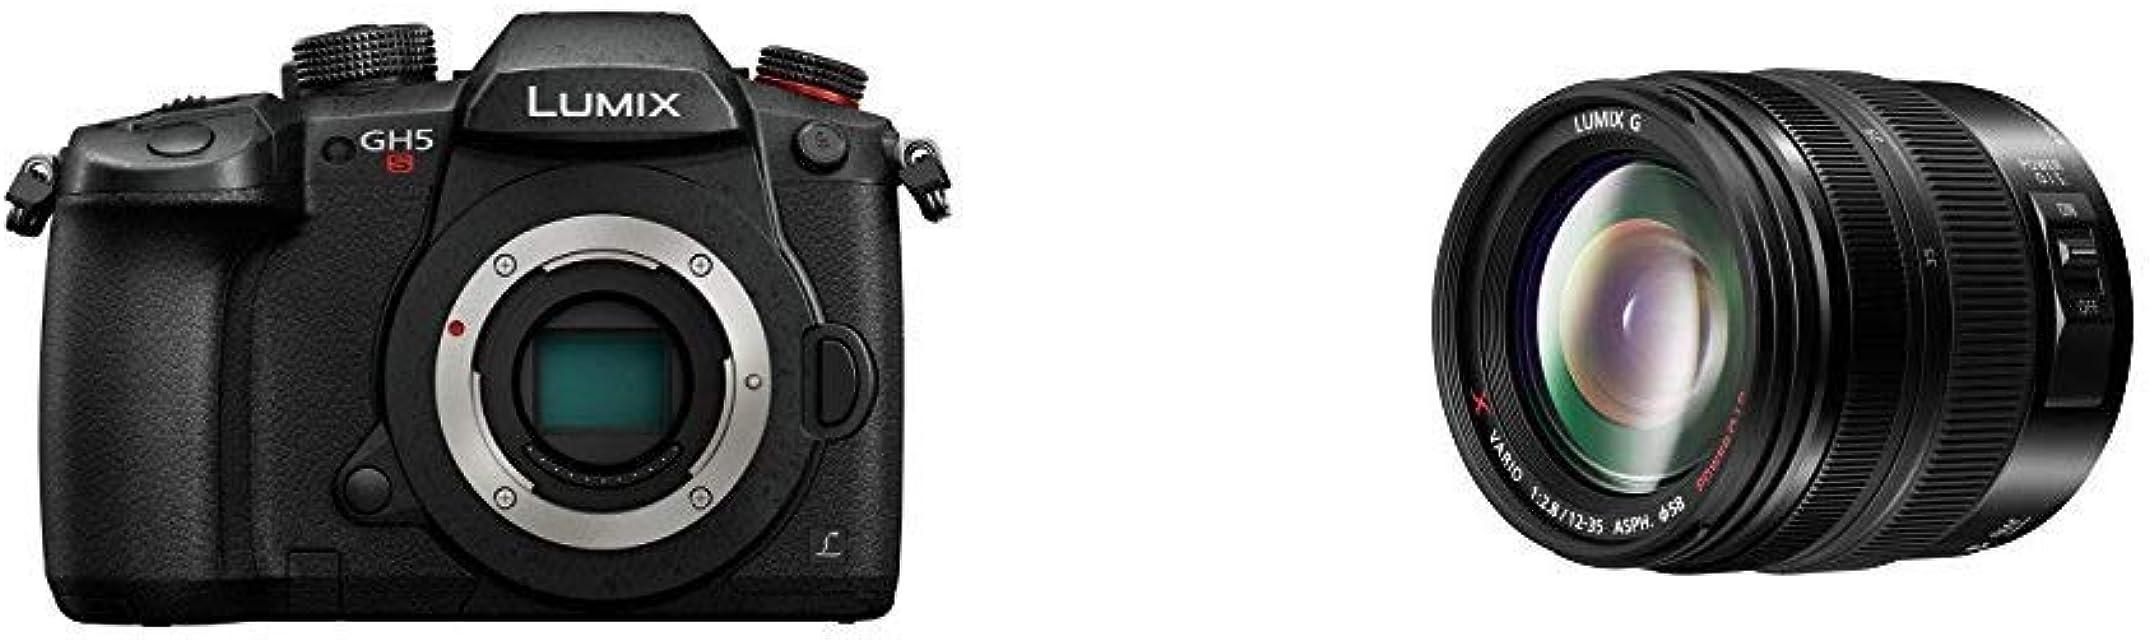 Panasonic Lumix DC-GH5S - Cámara Evil de 10.28 MP + Panasonic Lumiz G X Vario H-HSA12035E Lente CSC Micro 4/3